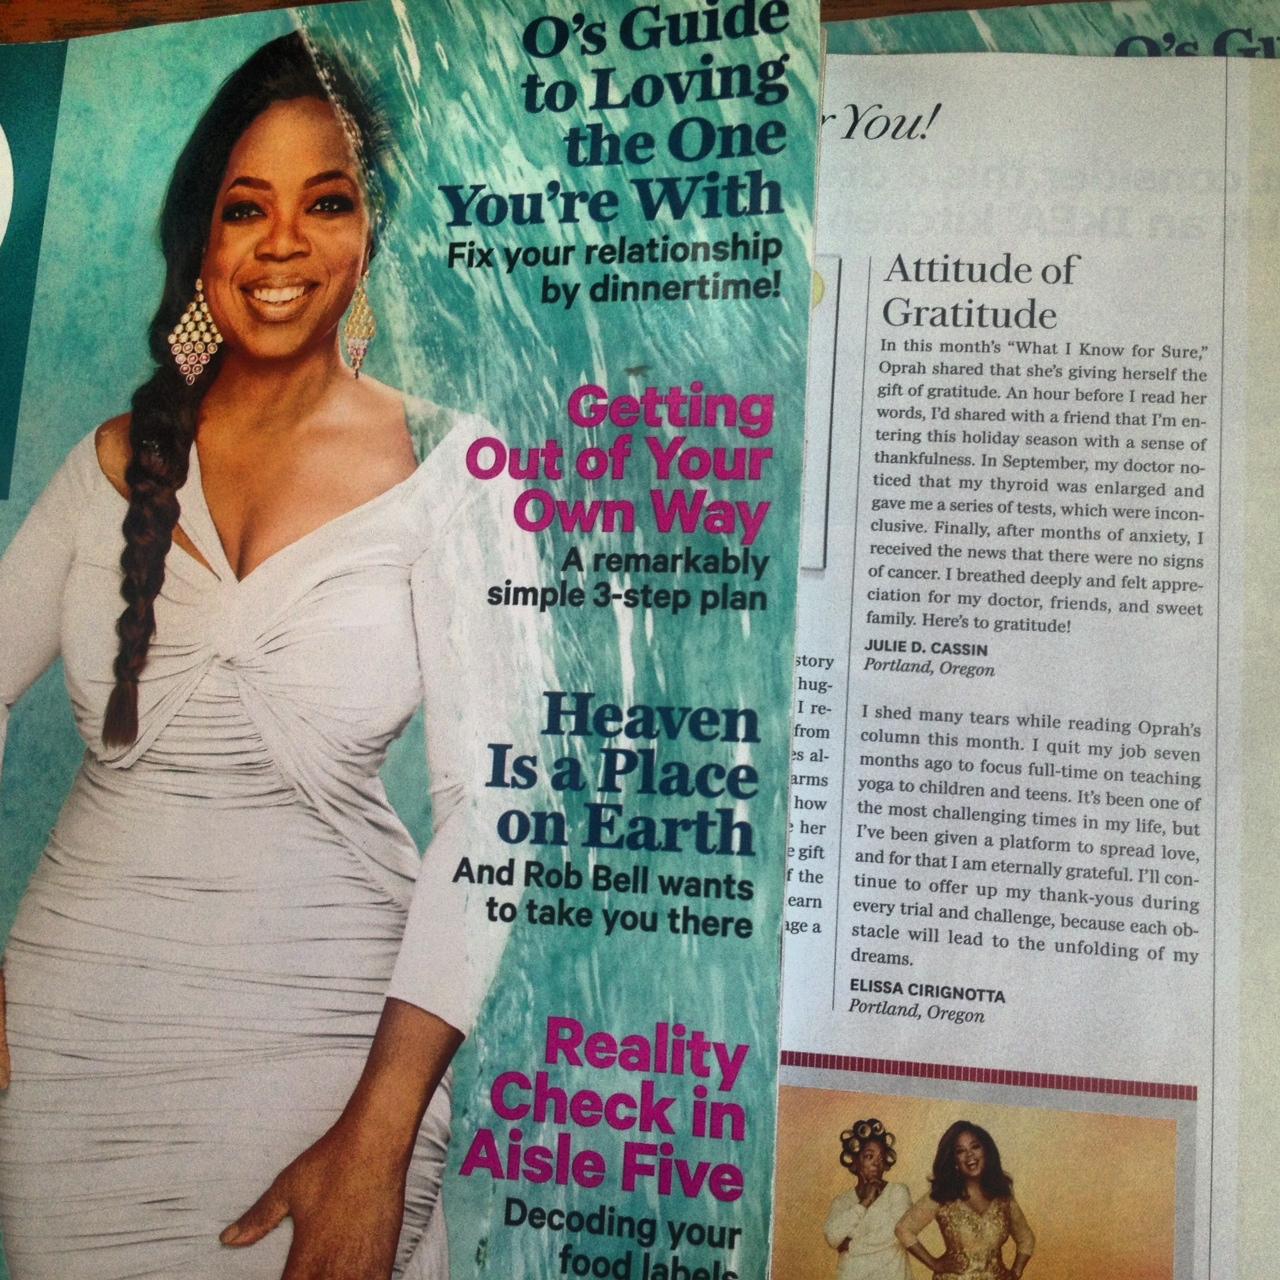 The Oprah Magazine February 2014